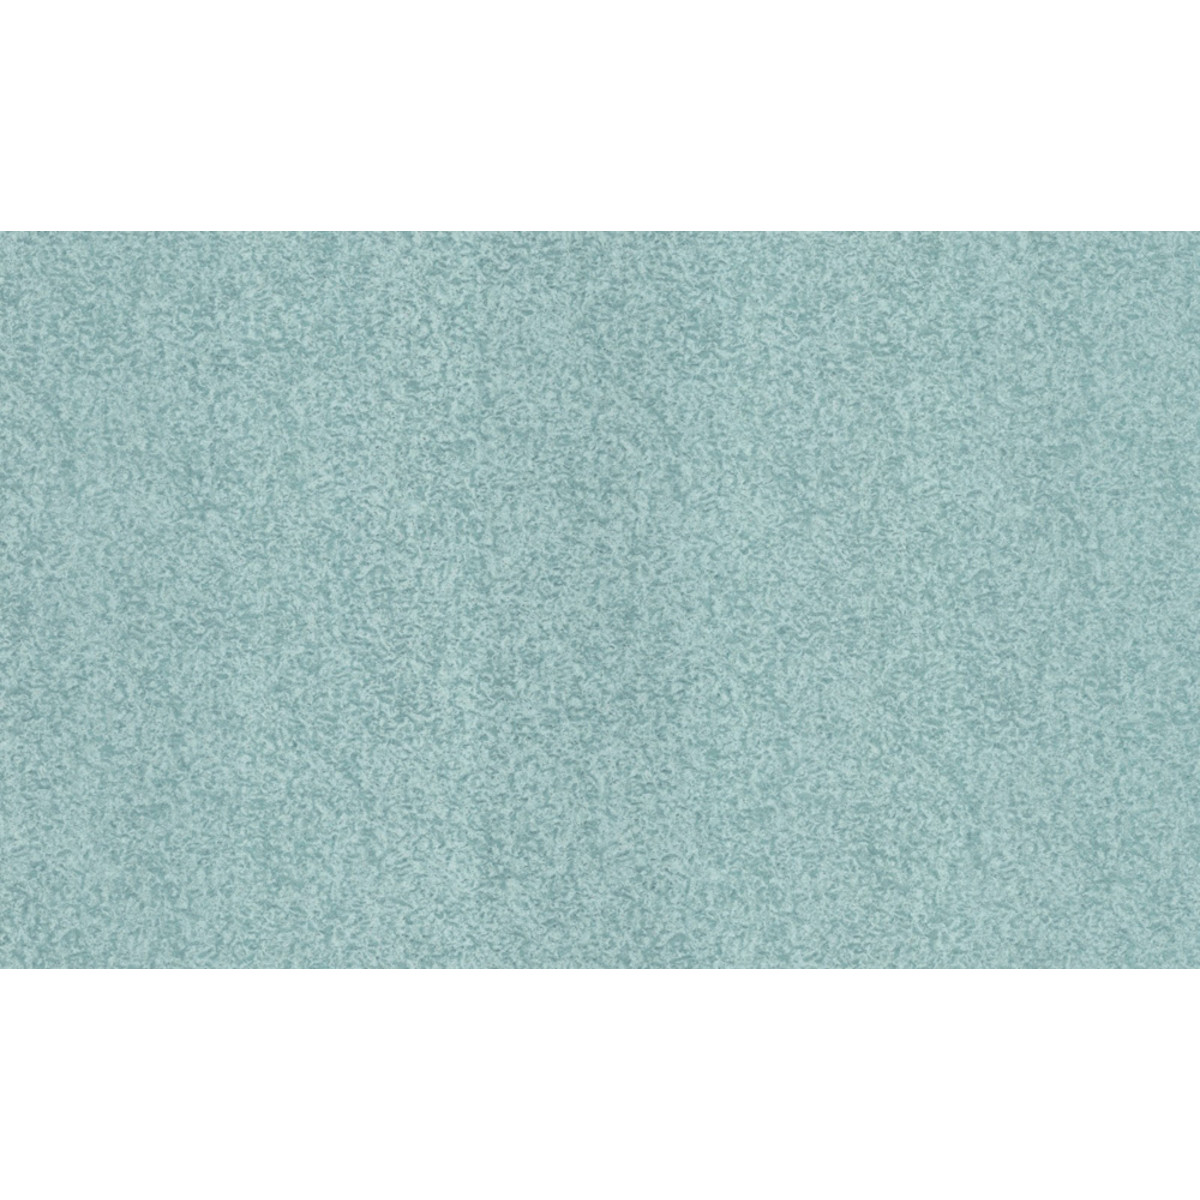 Обои флизелиновые Maxwall голубые 1.06 м 159082-28